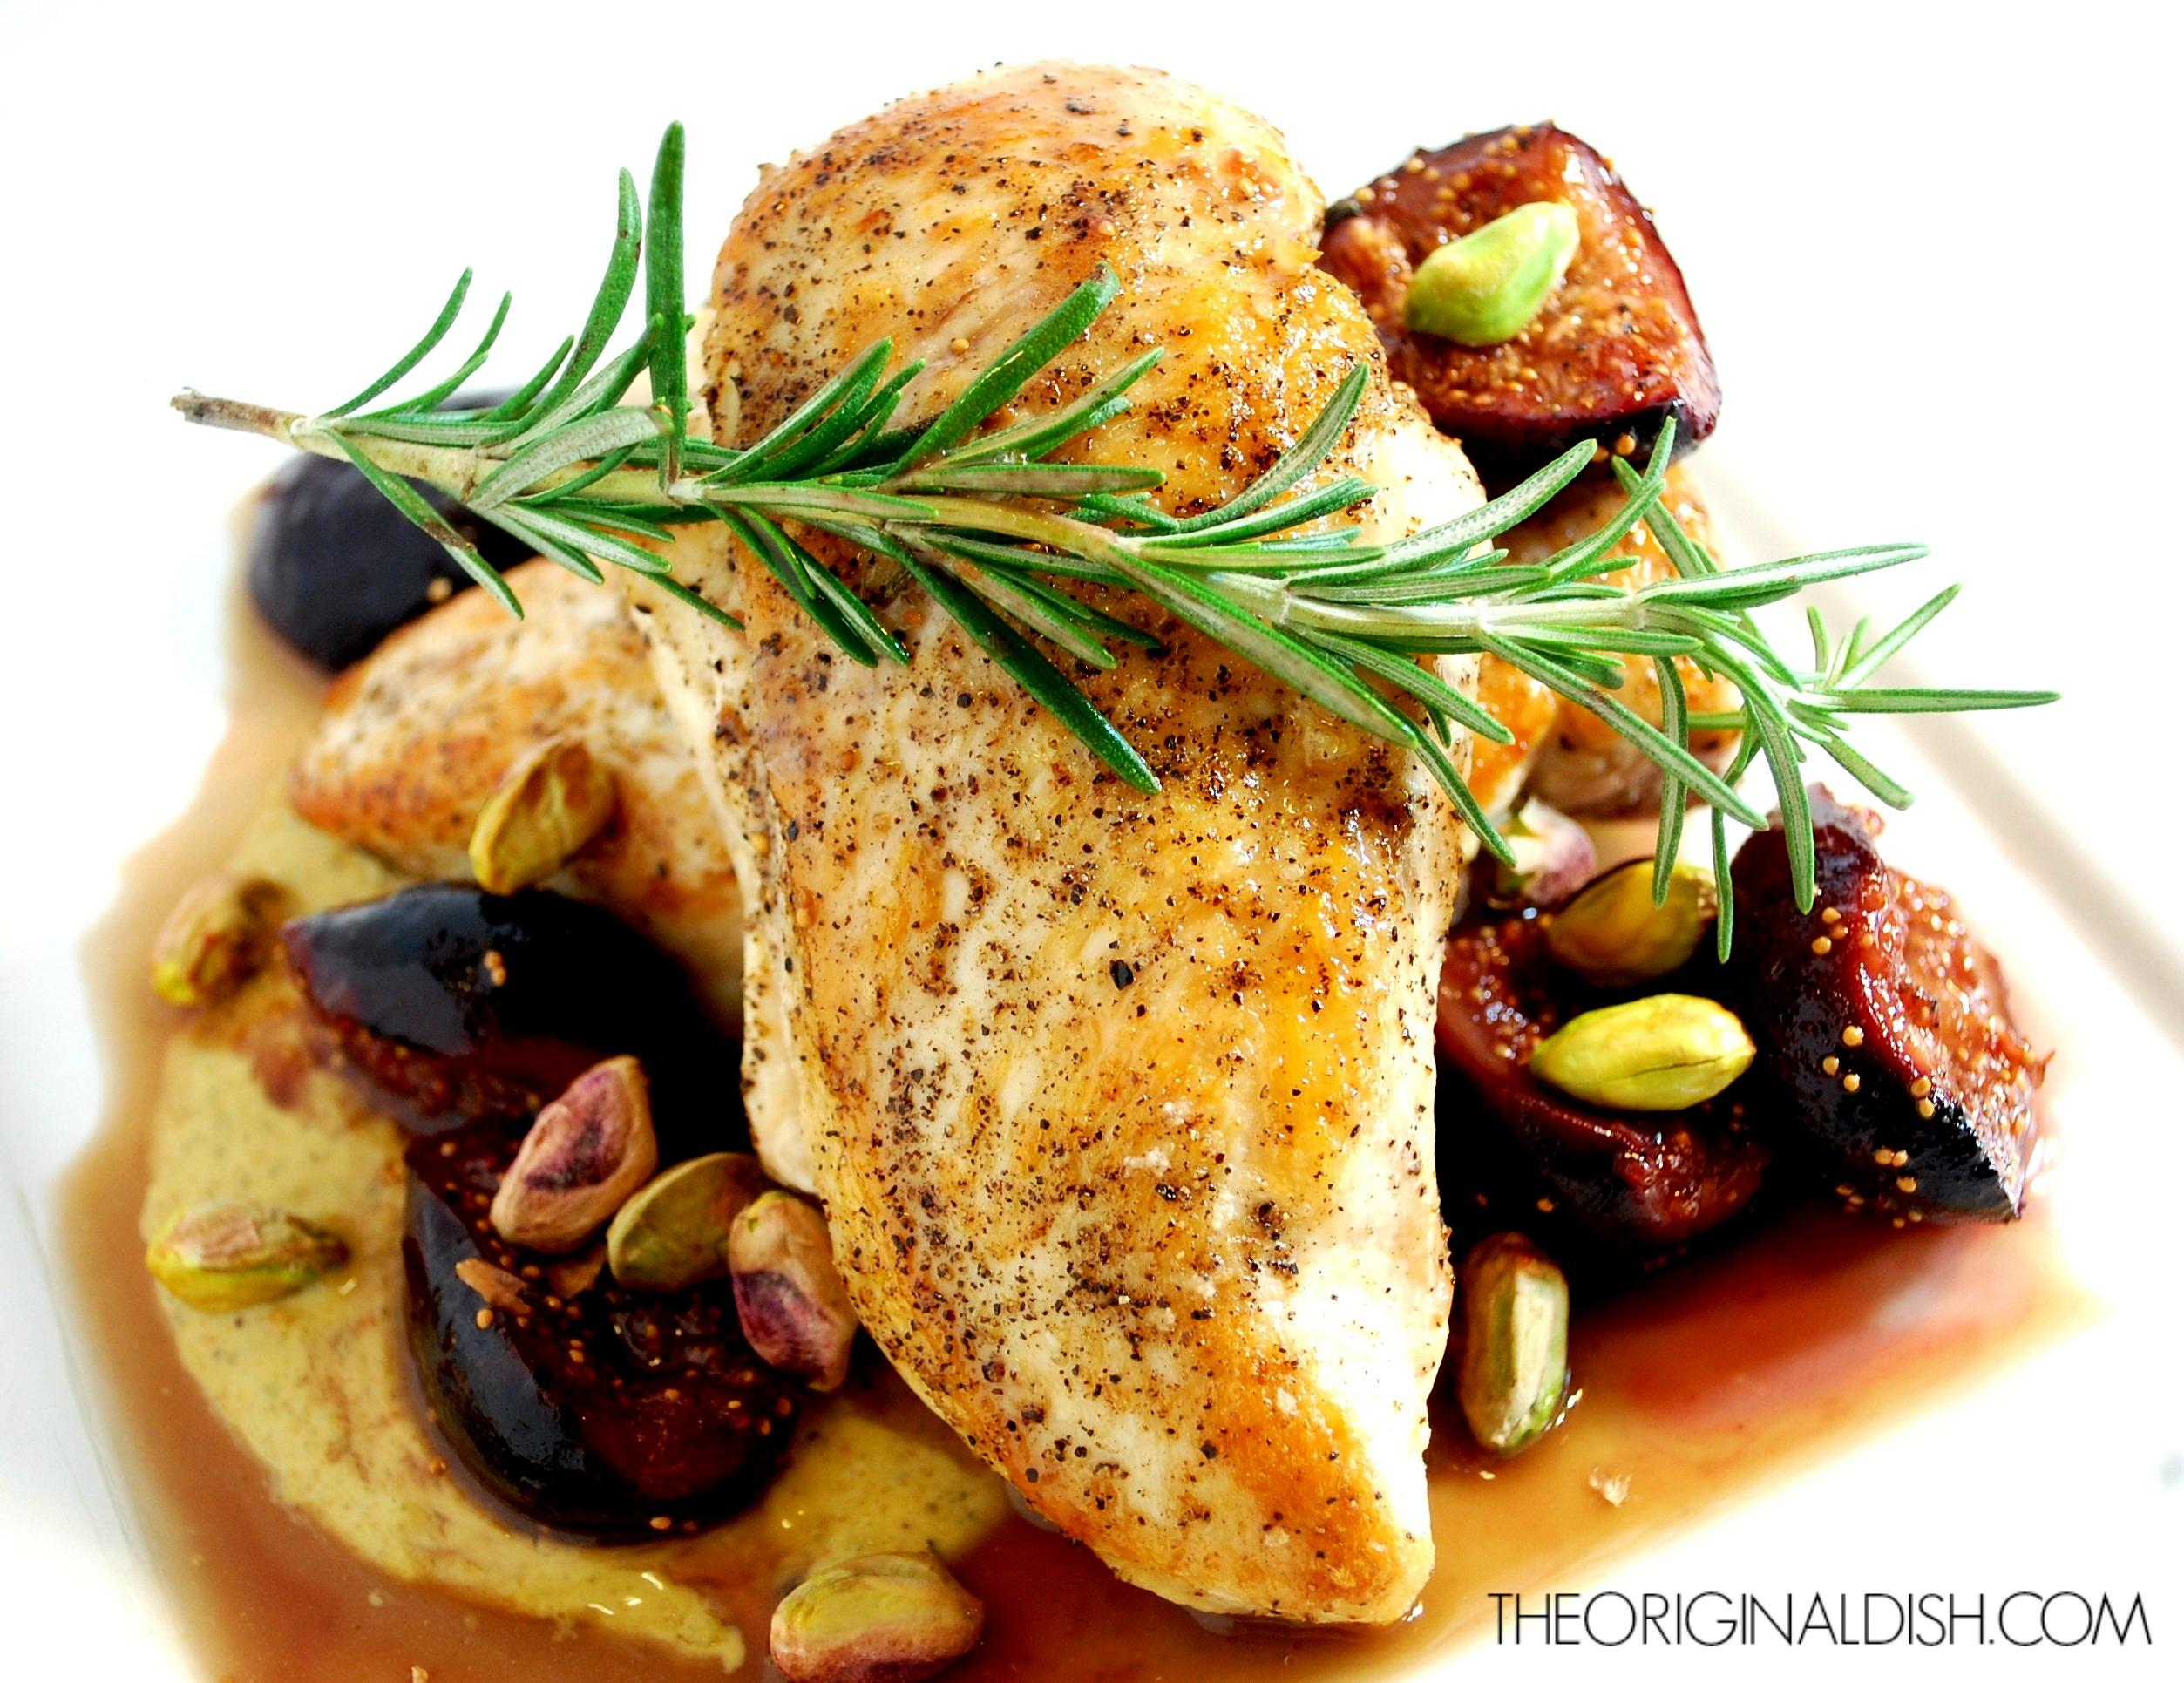 ... with Pistachio Yogurt, Caramelized Figs & Port | the original dish